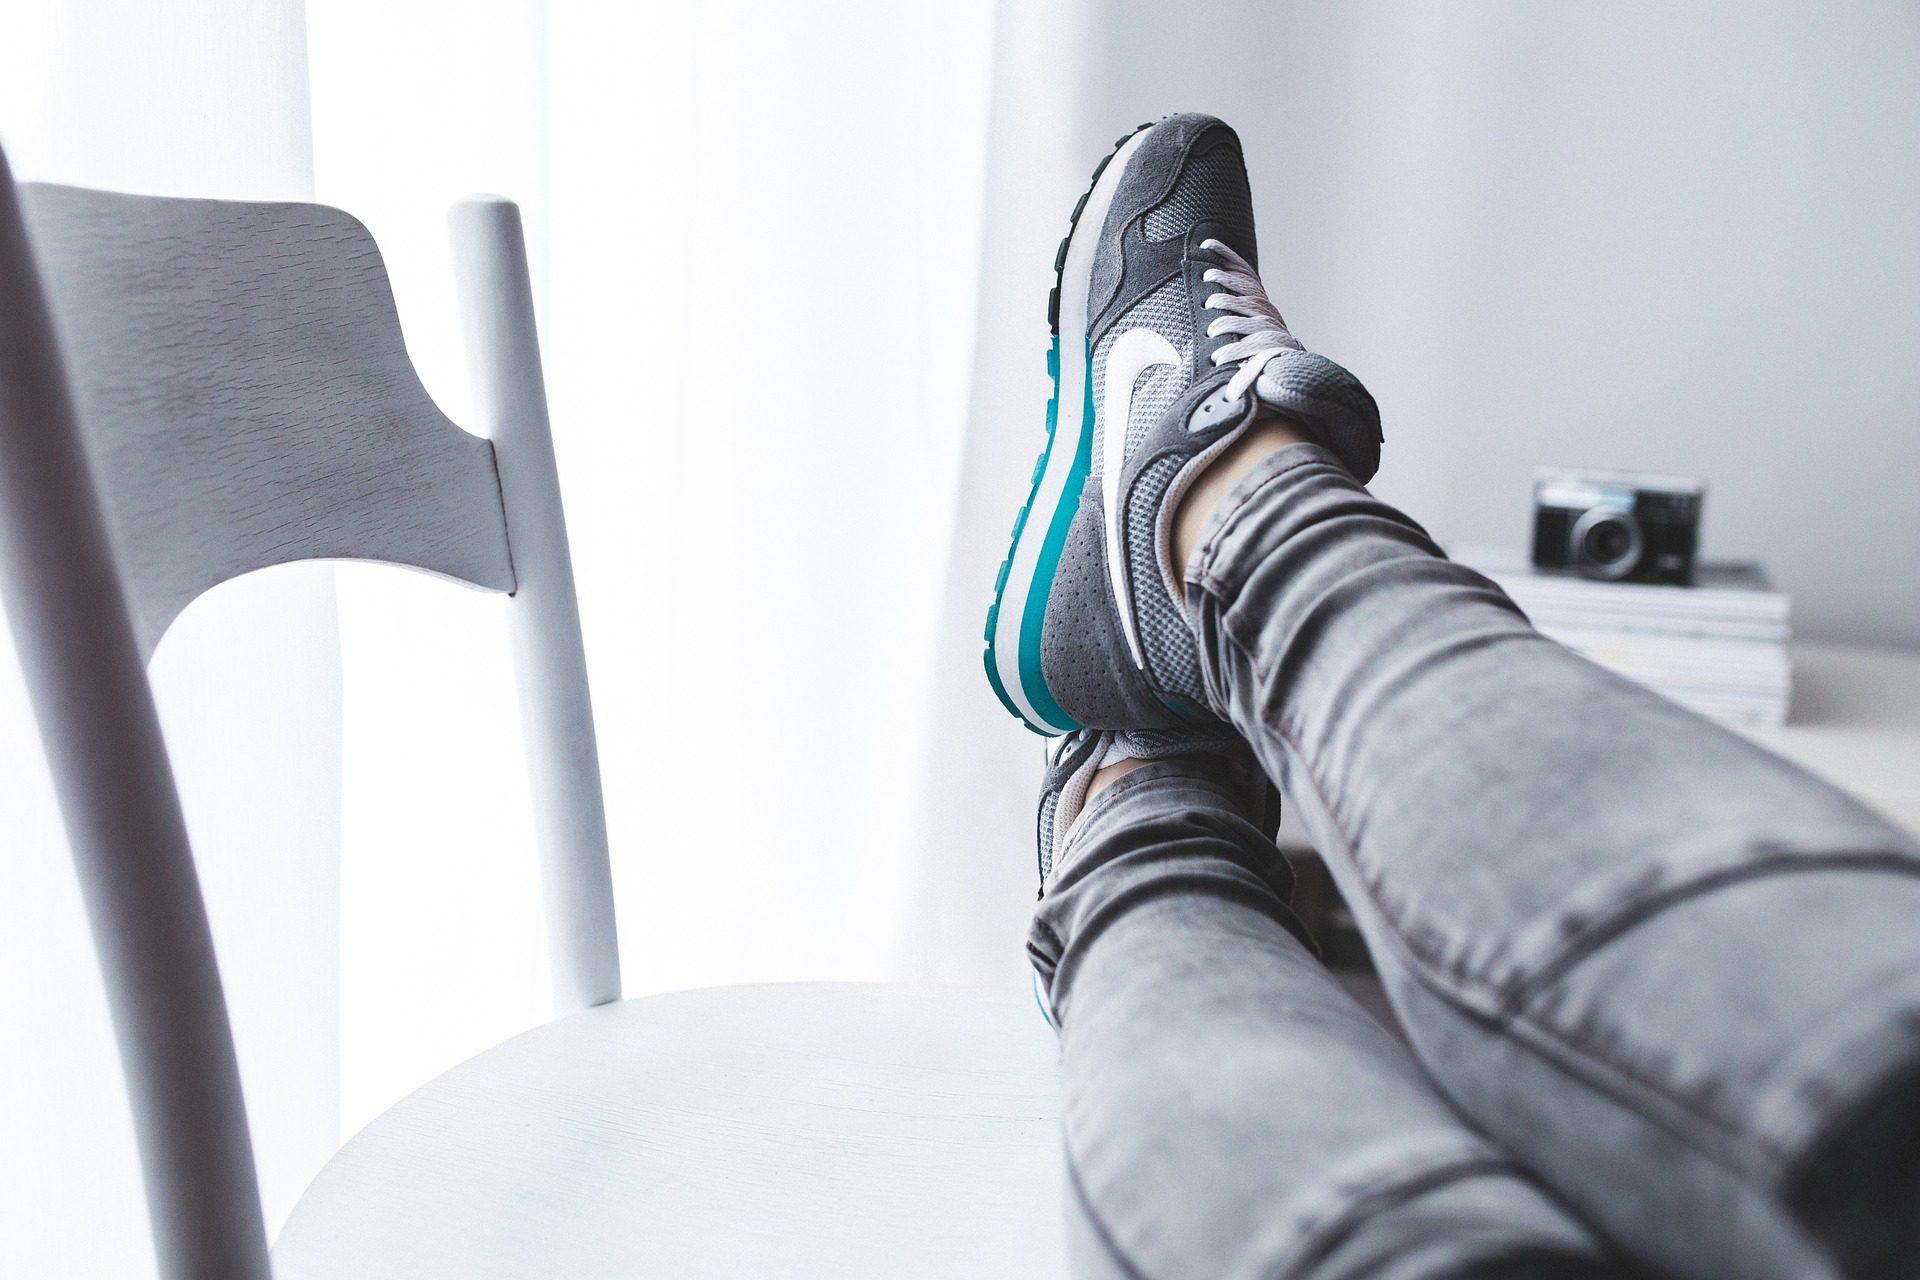 gambe, Pantofole, Sport, Sedia, resto, rilassarsi - Sfondi HD - Professor-falken.com